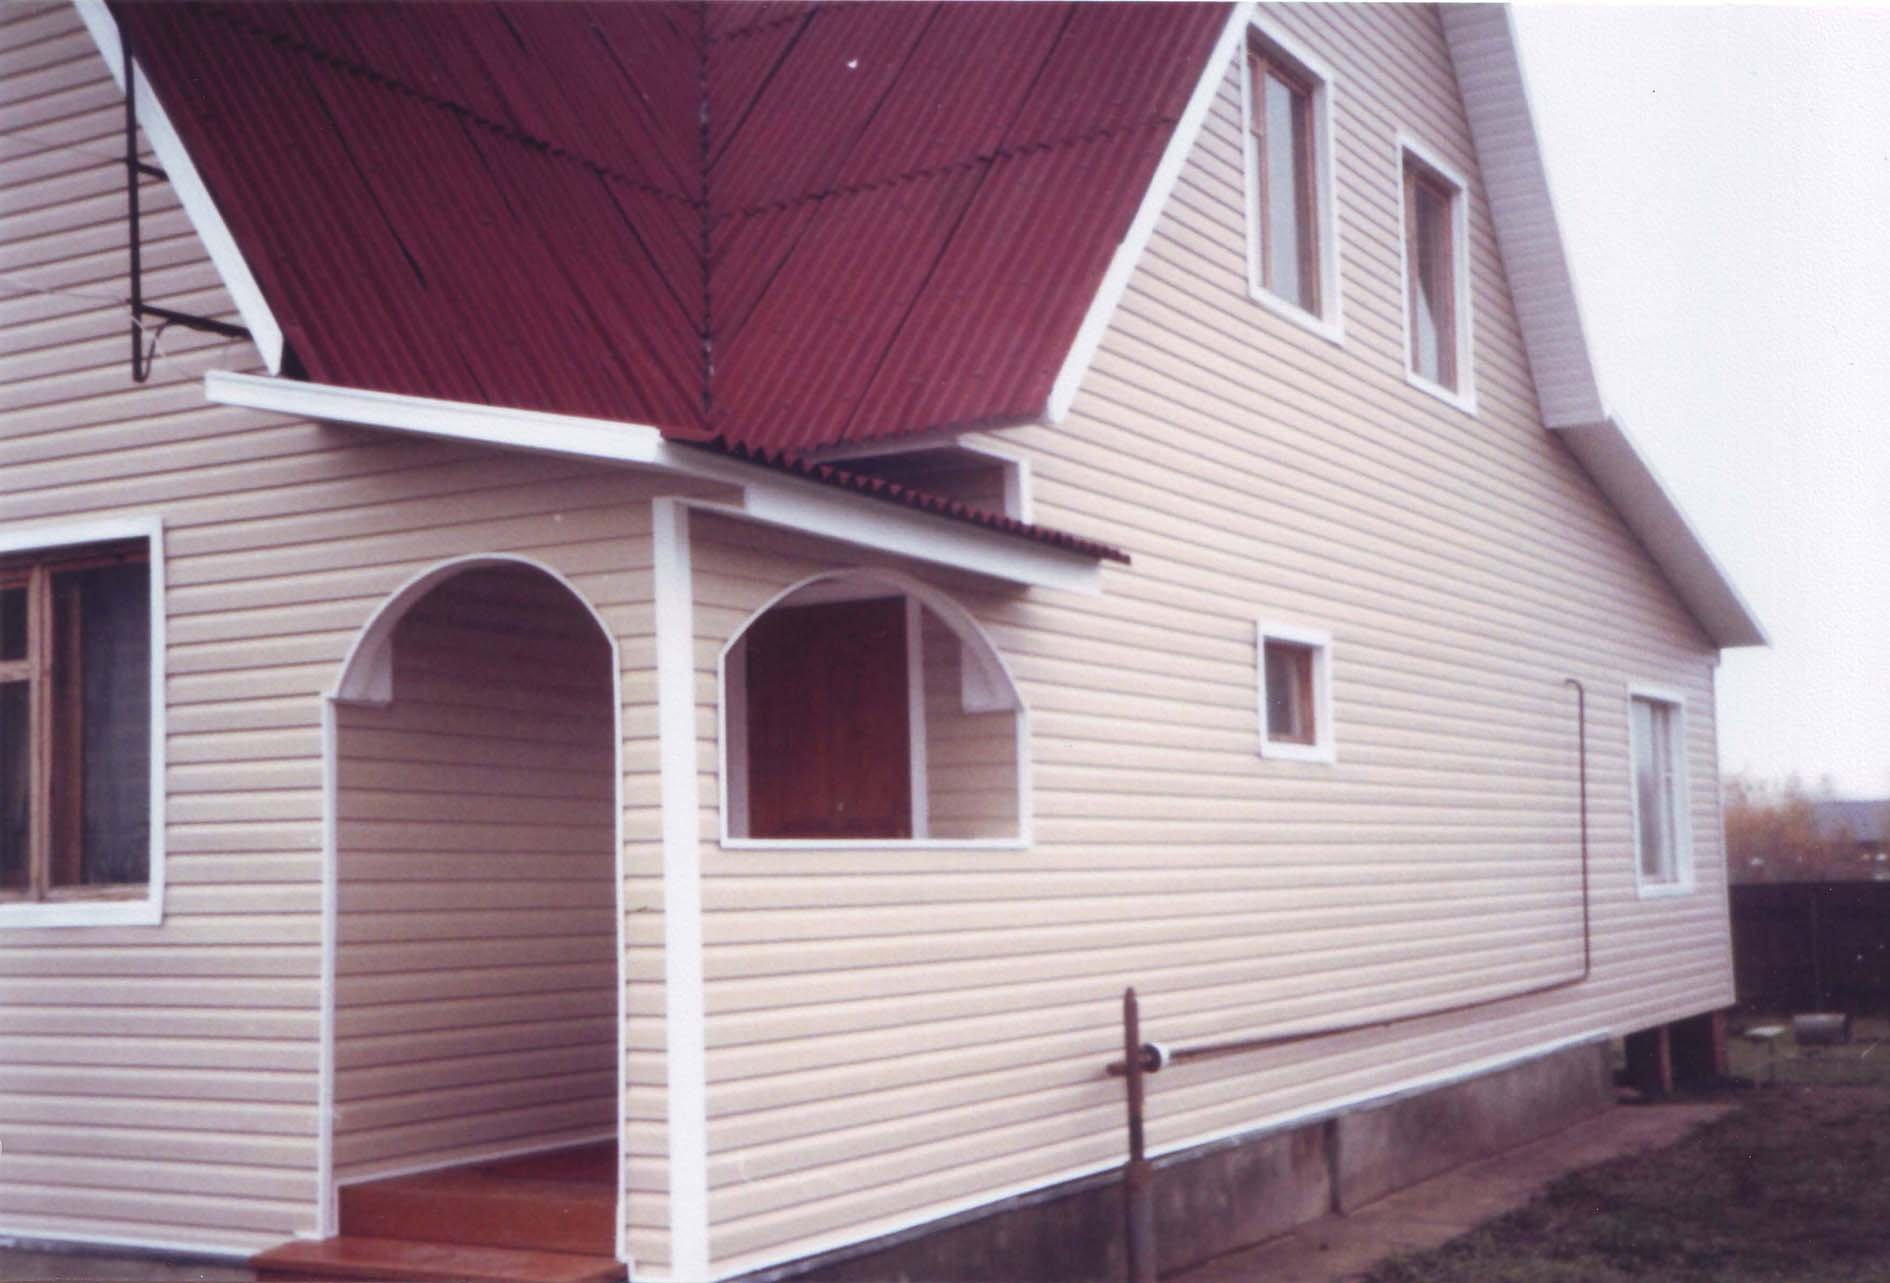 pose lambris mural horizontal renovation d appartement saint denis soci t bll. Black Bedroom Furniture Sets. Home Design Ideas